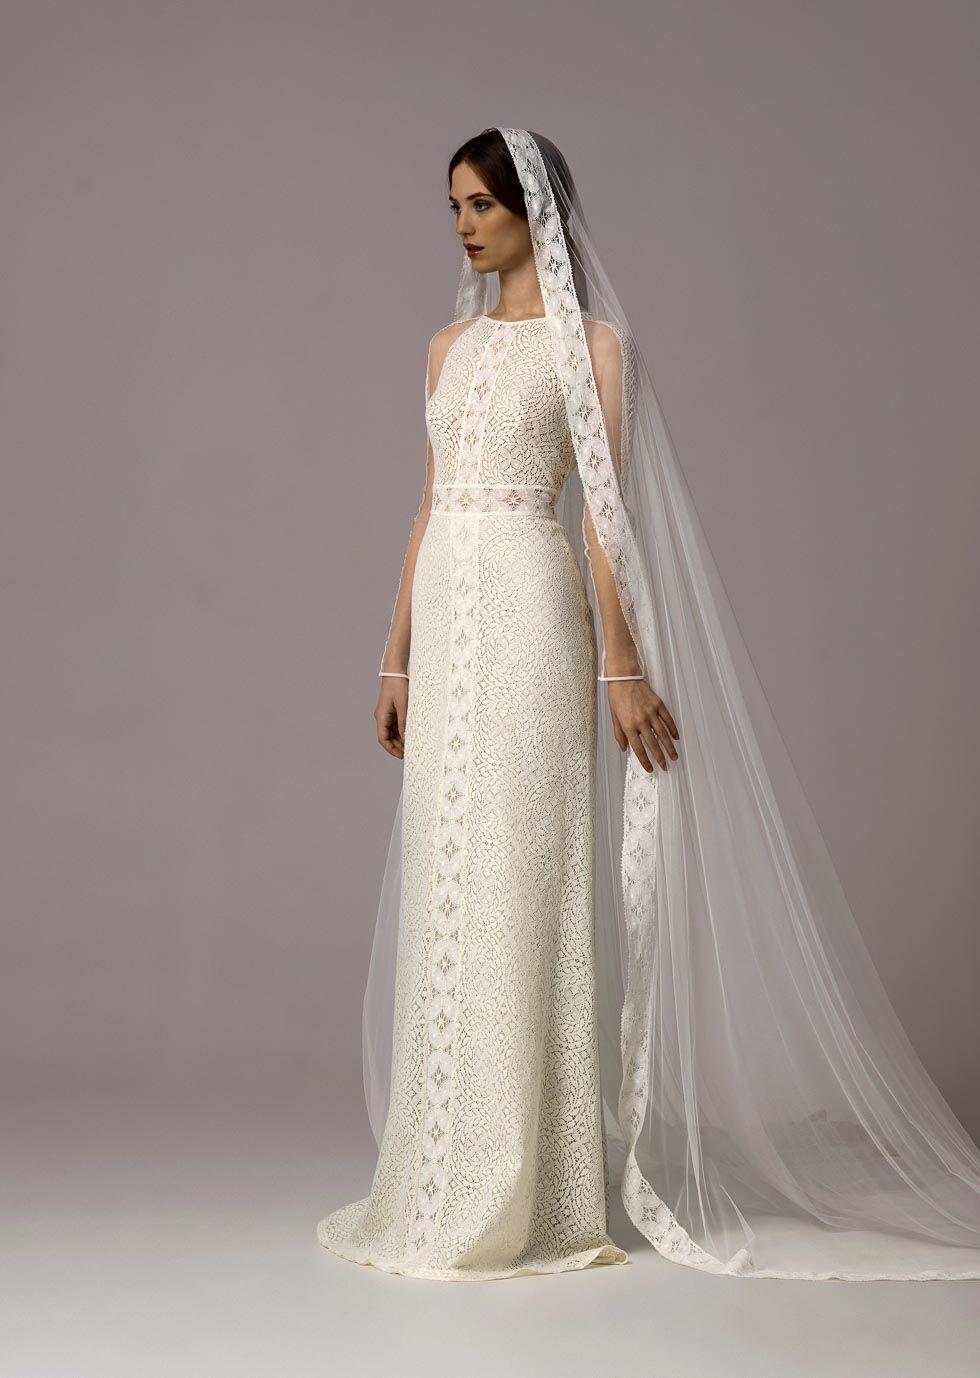 Anna kara wedding dresses pinterest anna and wedding dress